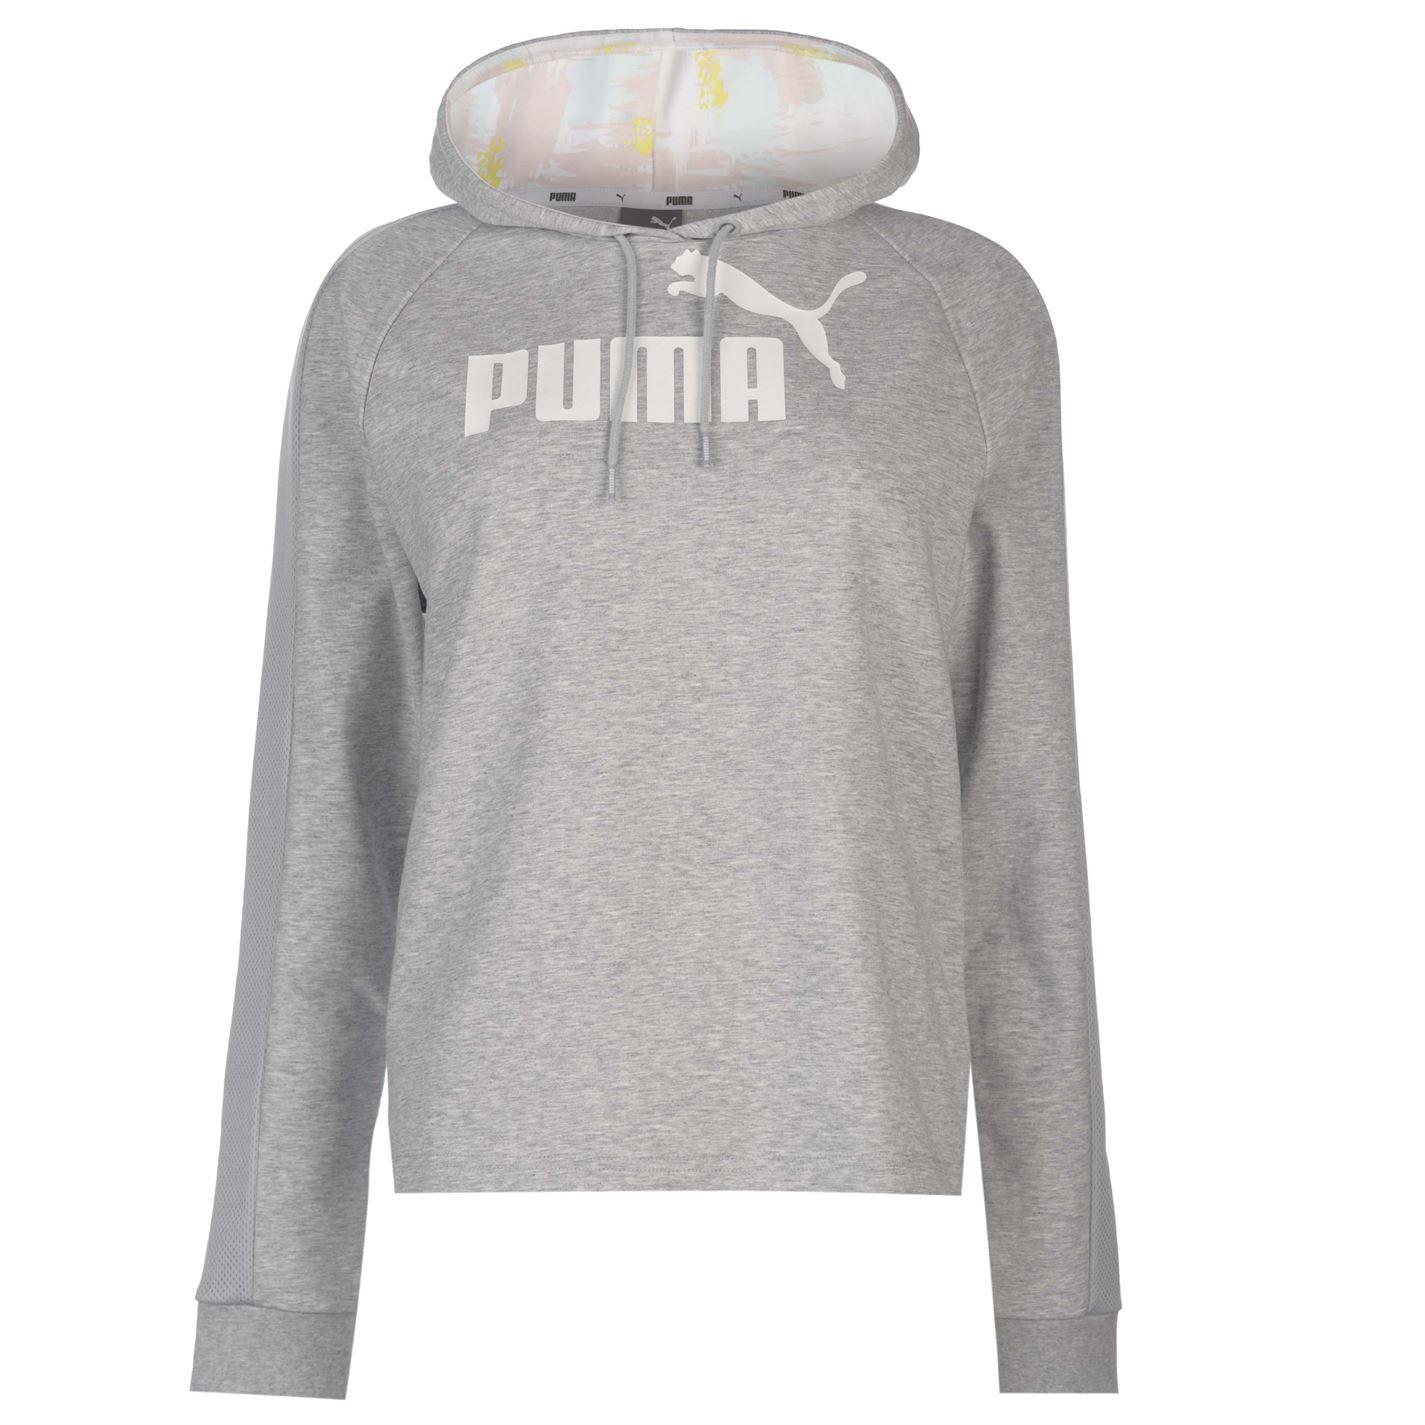 mikina Puma OTH Crop Hoody dámská